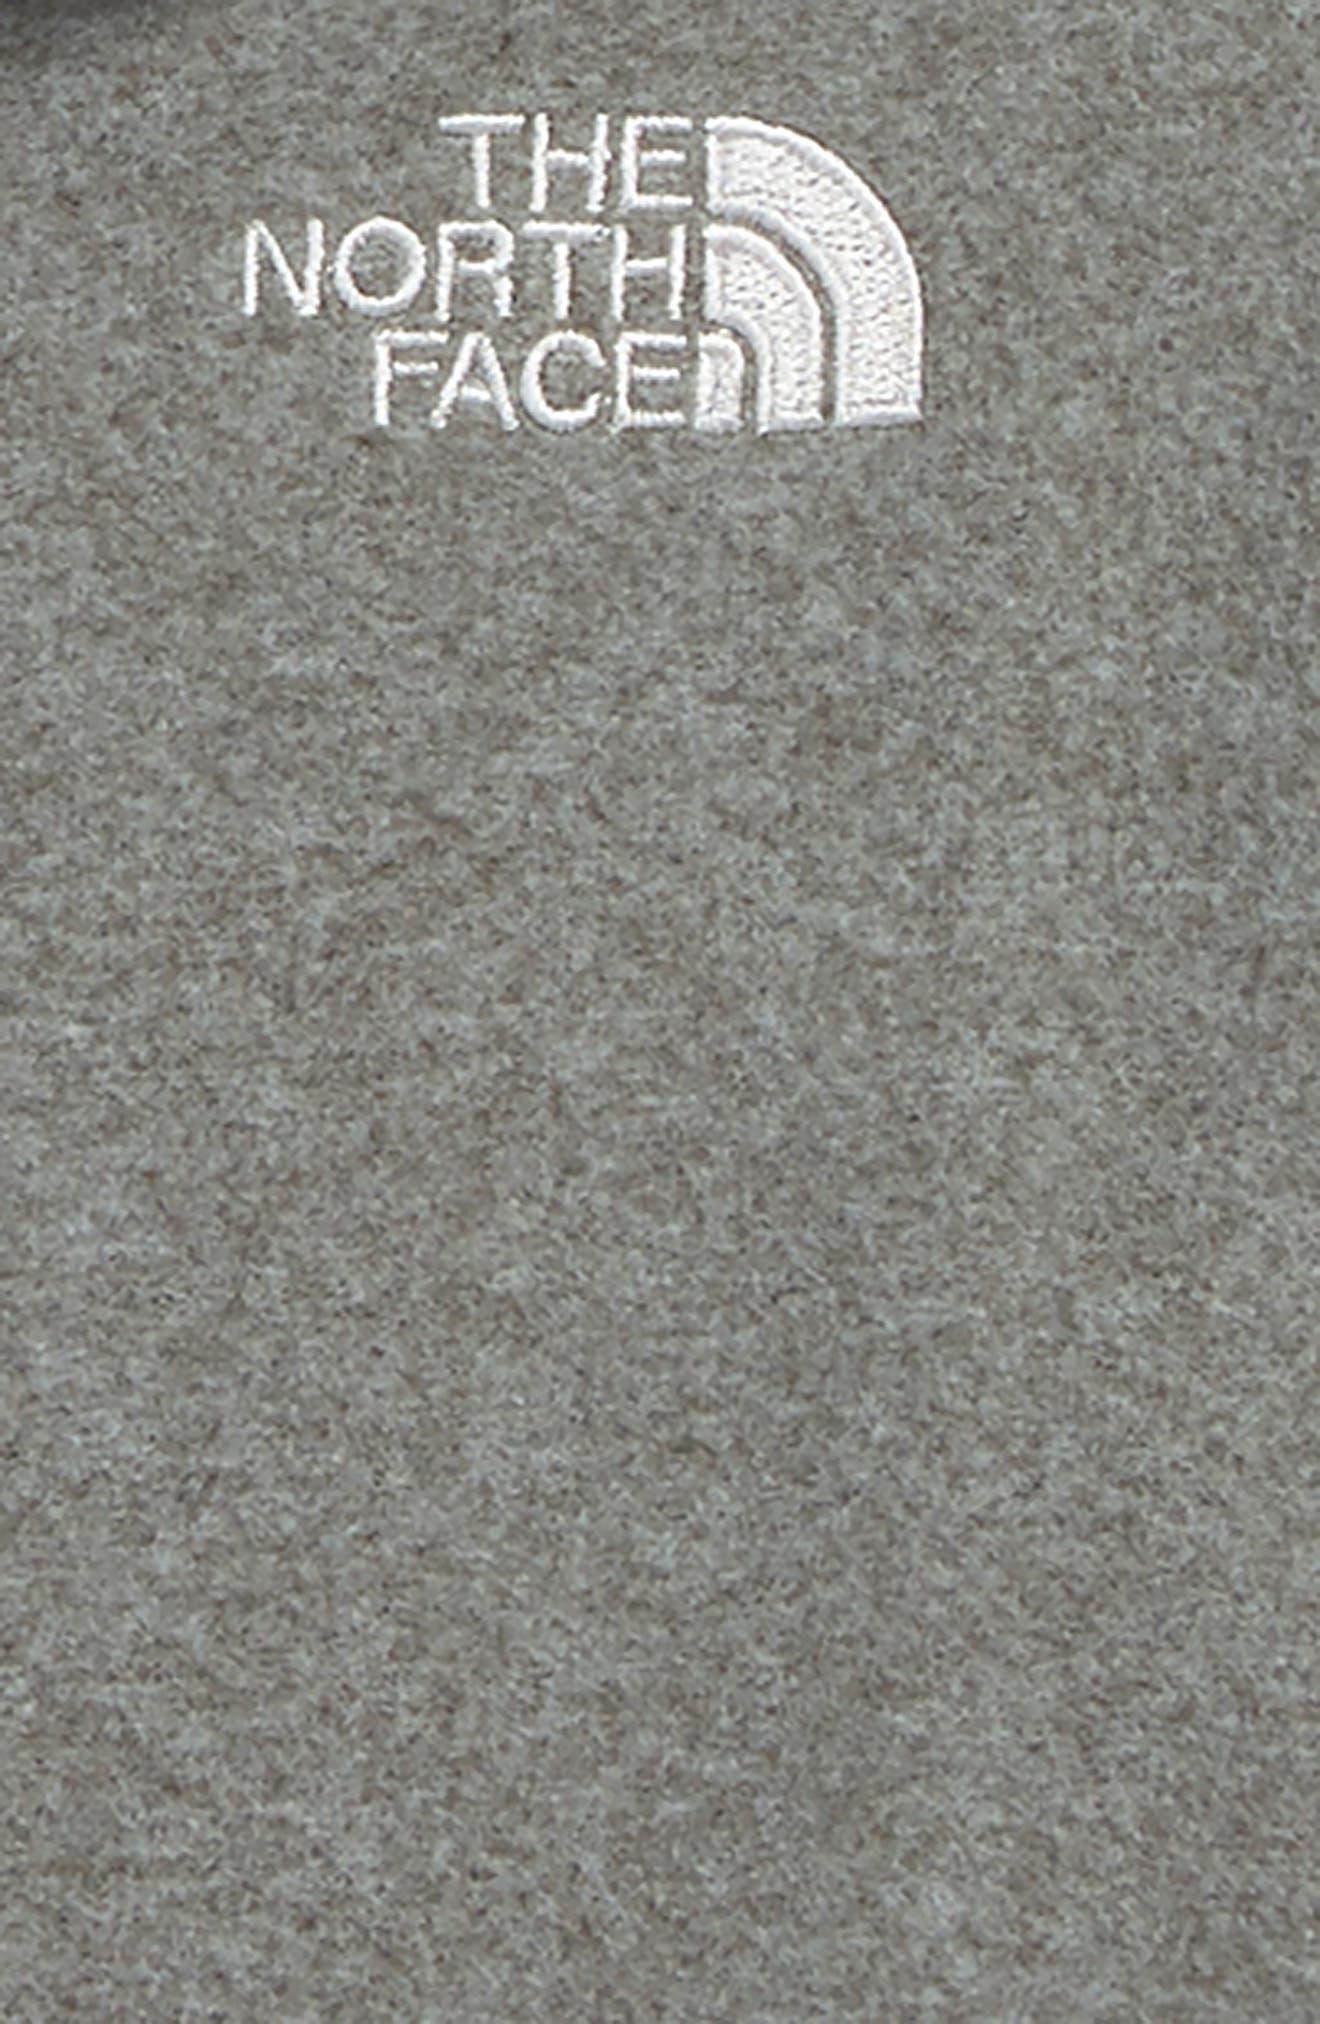 Glacier Full Zip Fleece Hoodie,                             Alternate thumbnail 2, color,                             TNF MEDIUM GREY HEATHER